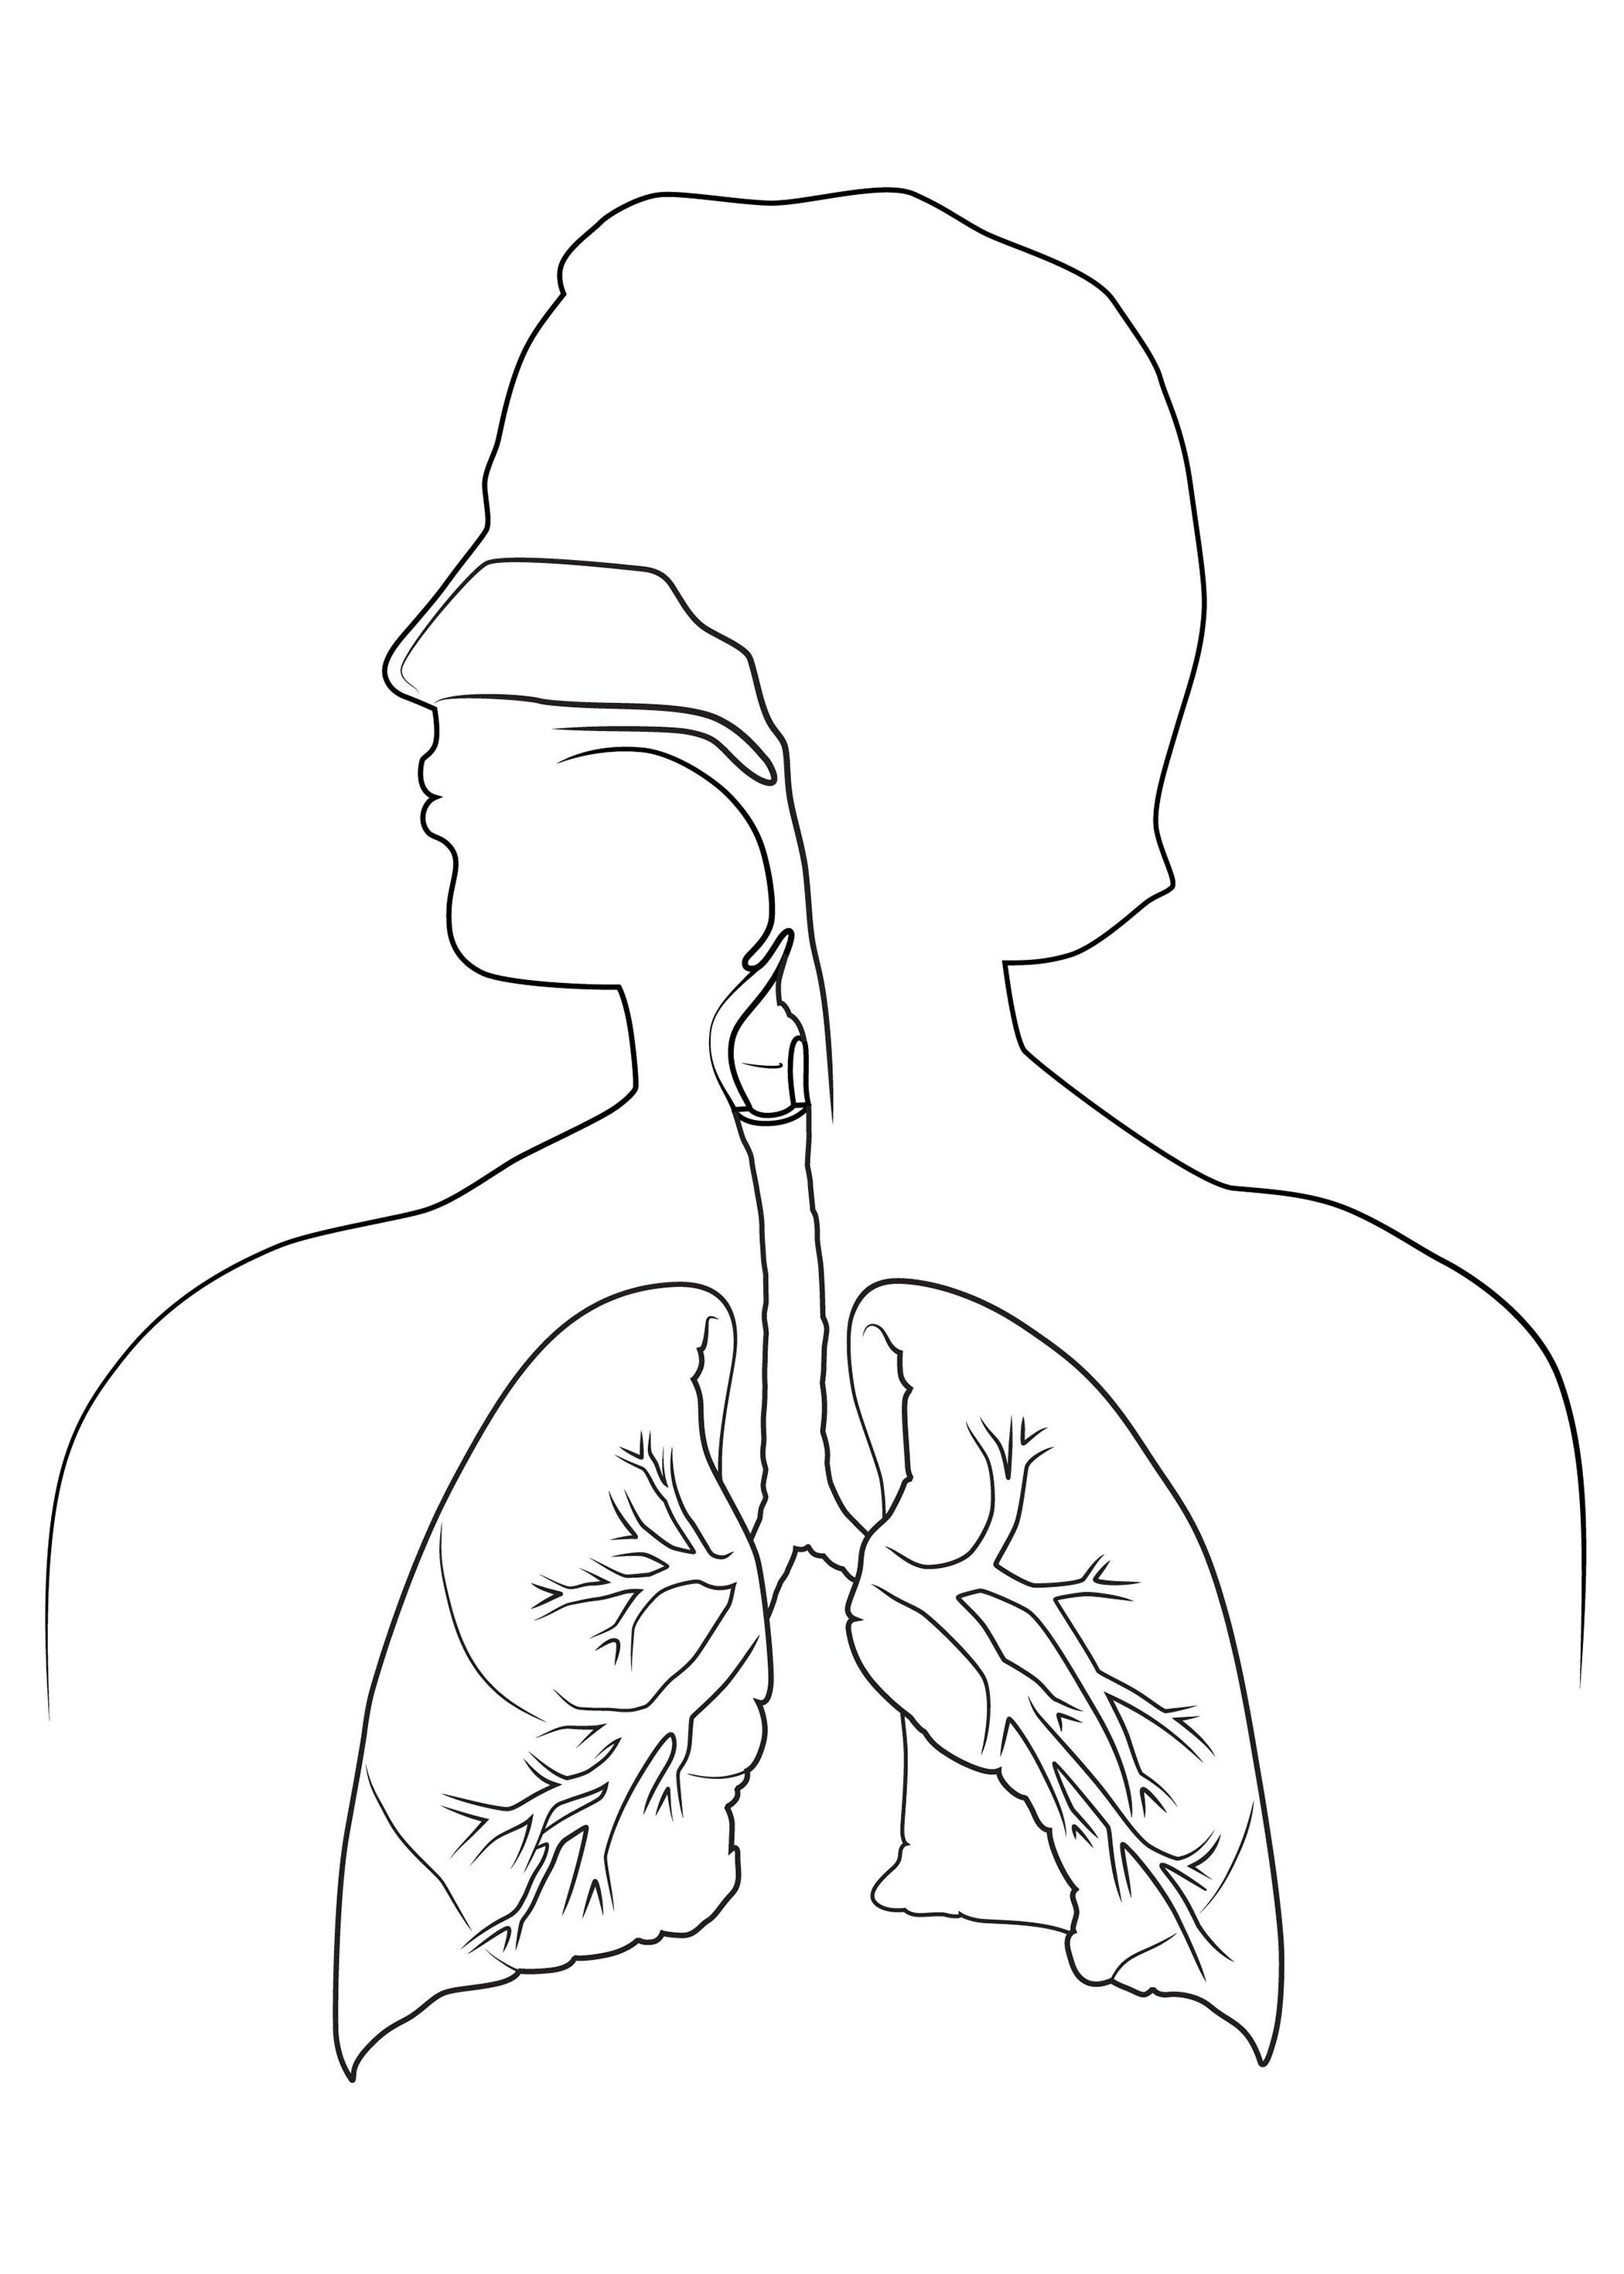 medical body drawing at getdrawings com